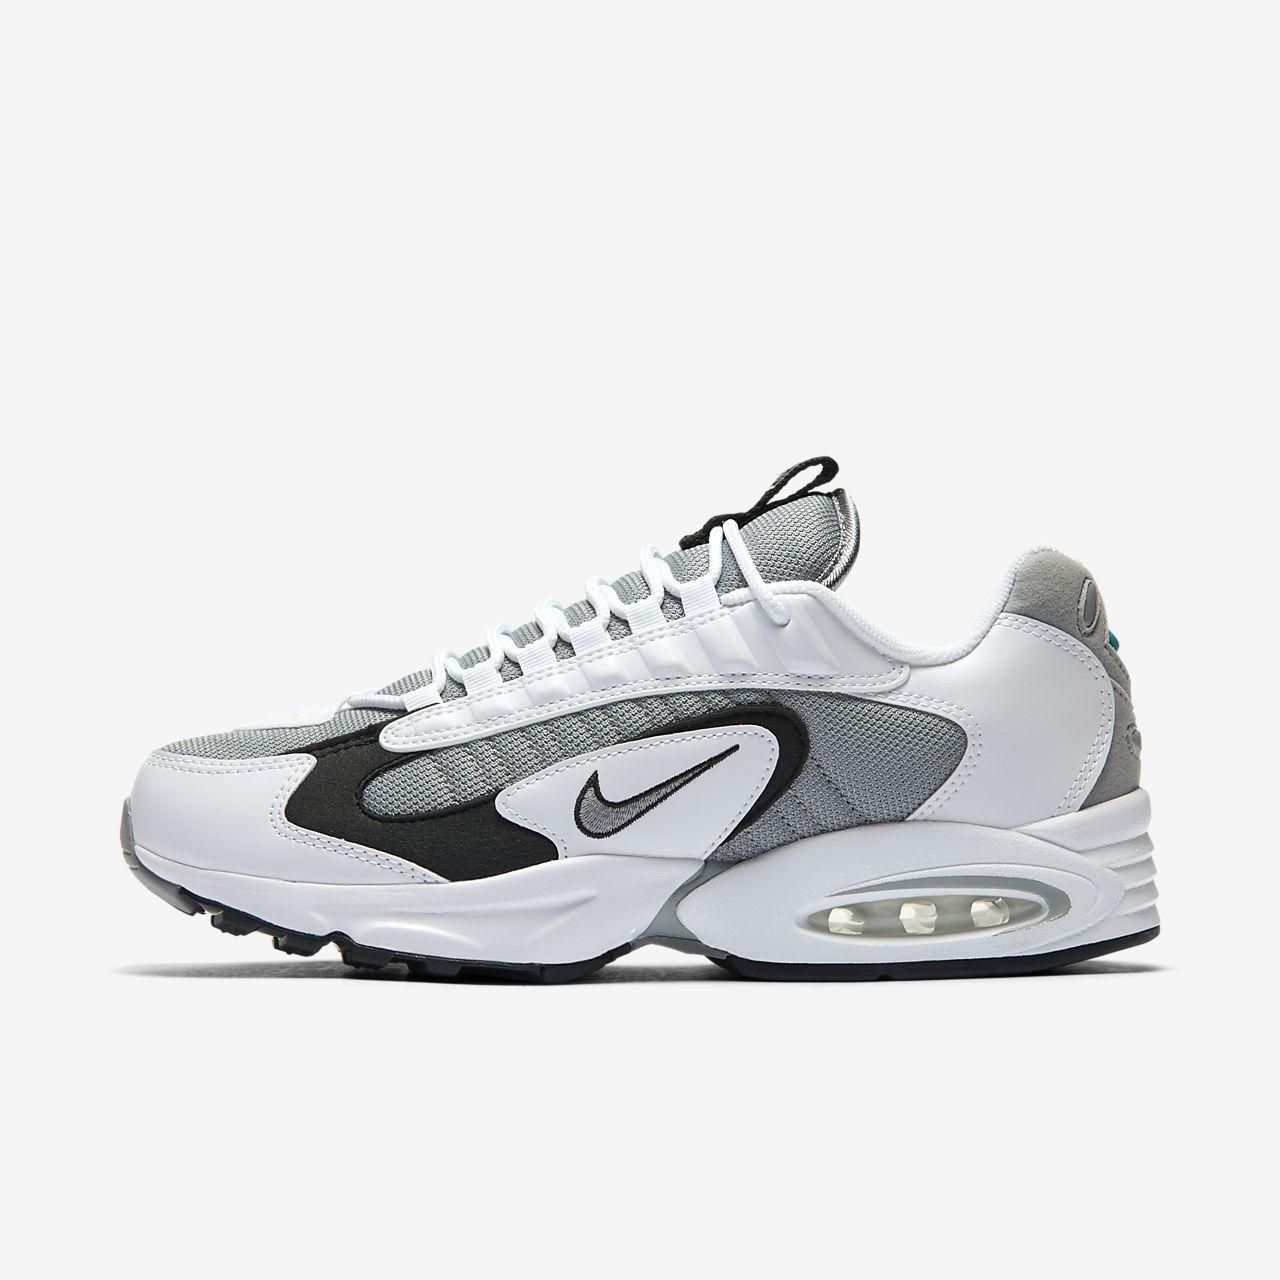 Nike Air Max 96 white black Men Running Shoes